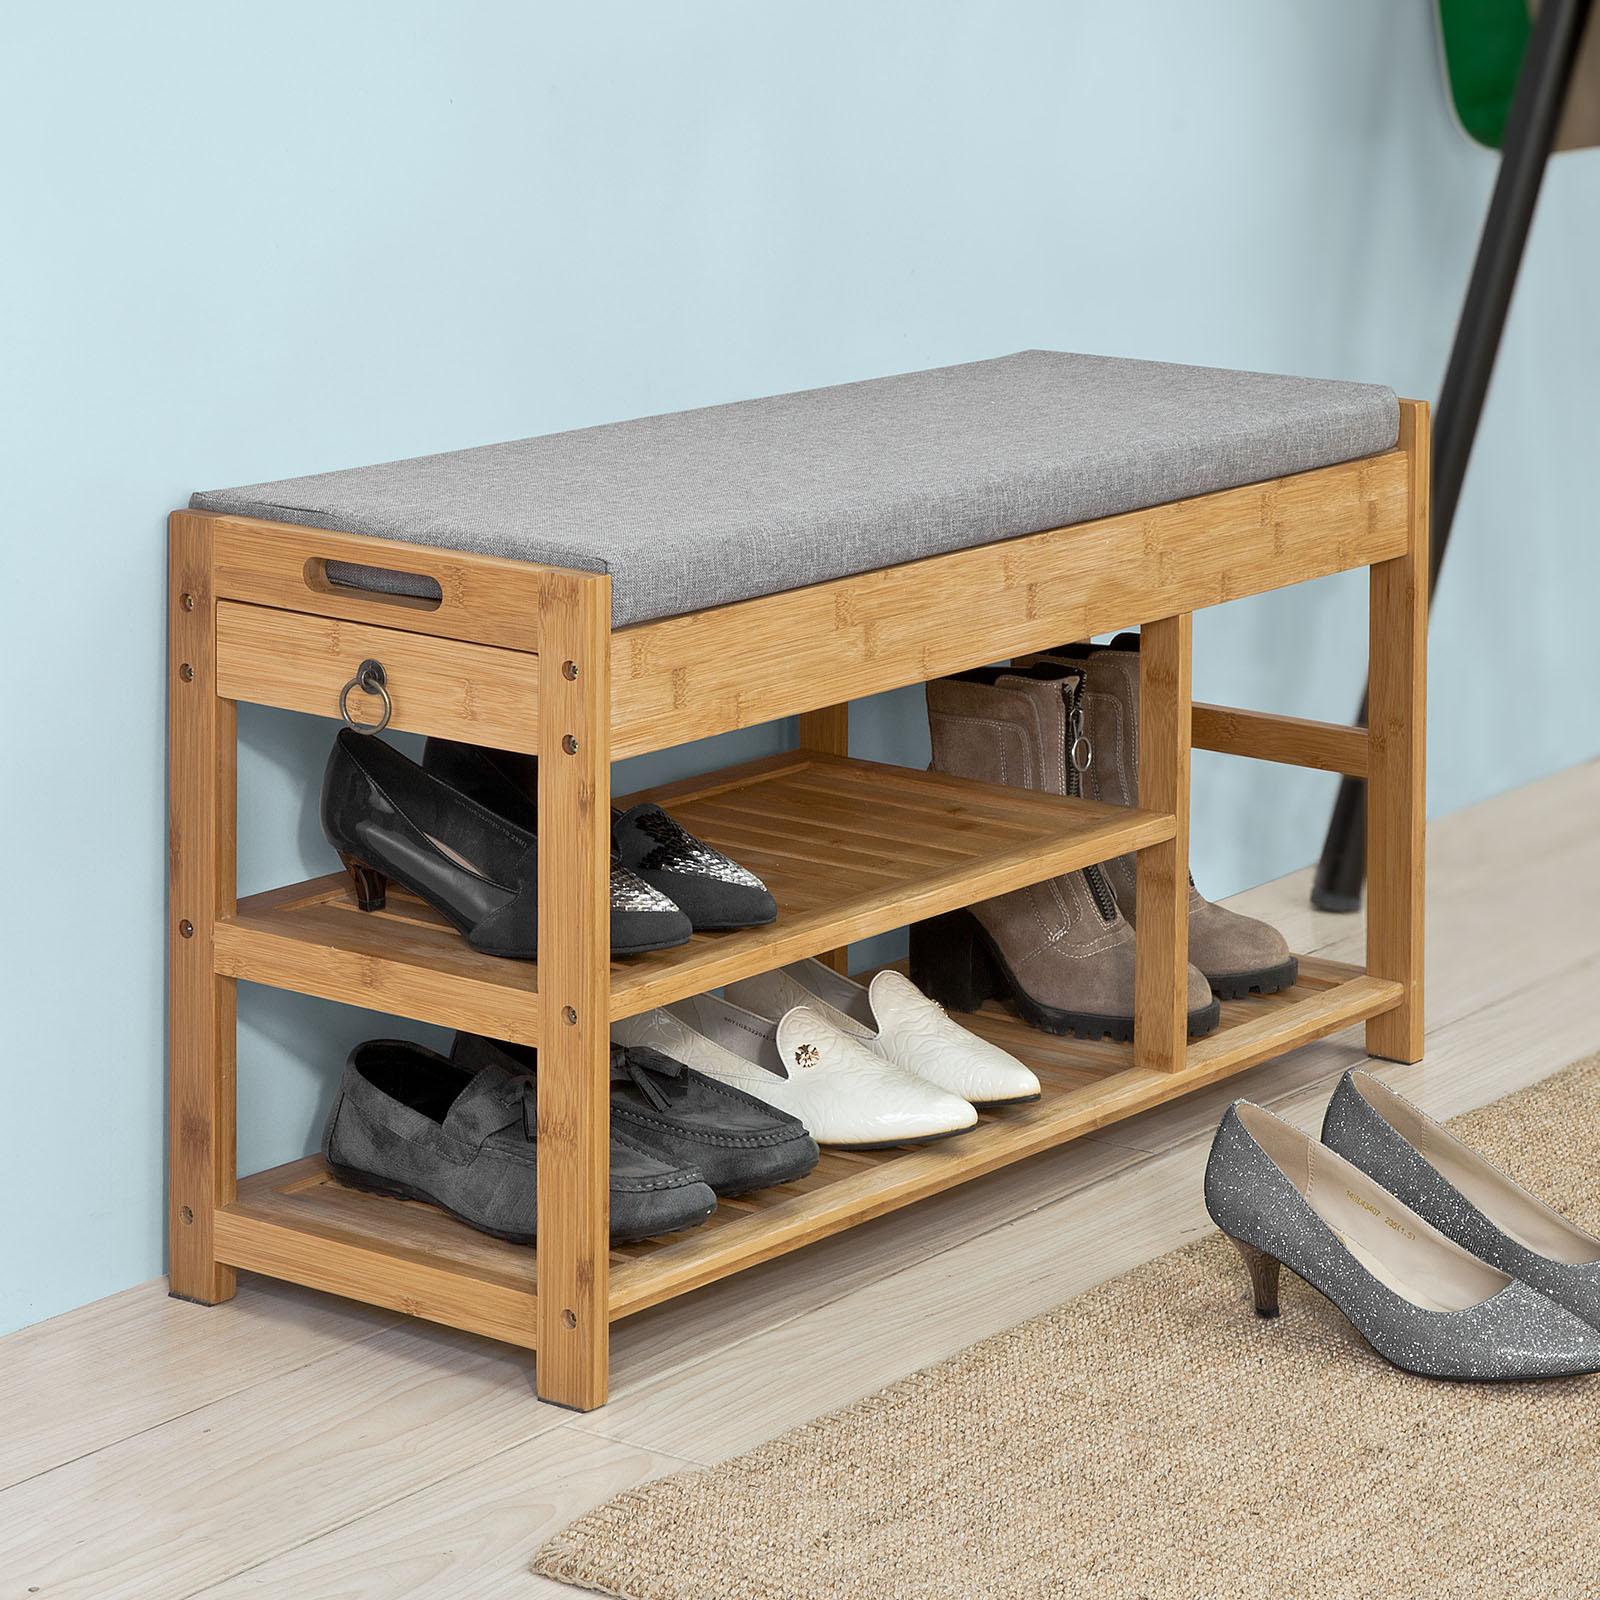 Easy Living Footwear Junction Fair Home: SoBuy® Padded Hallway Shoe Storage Rack Bench Seat With